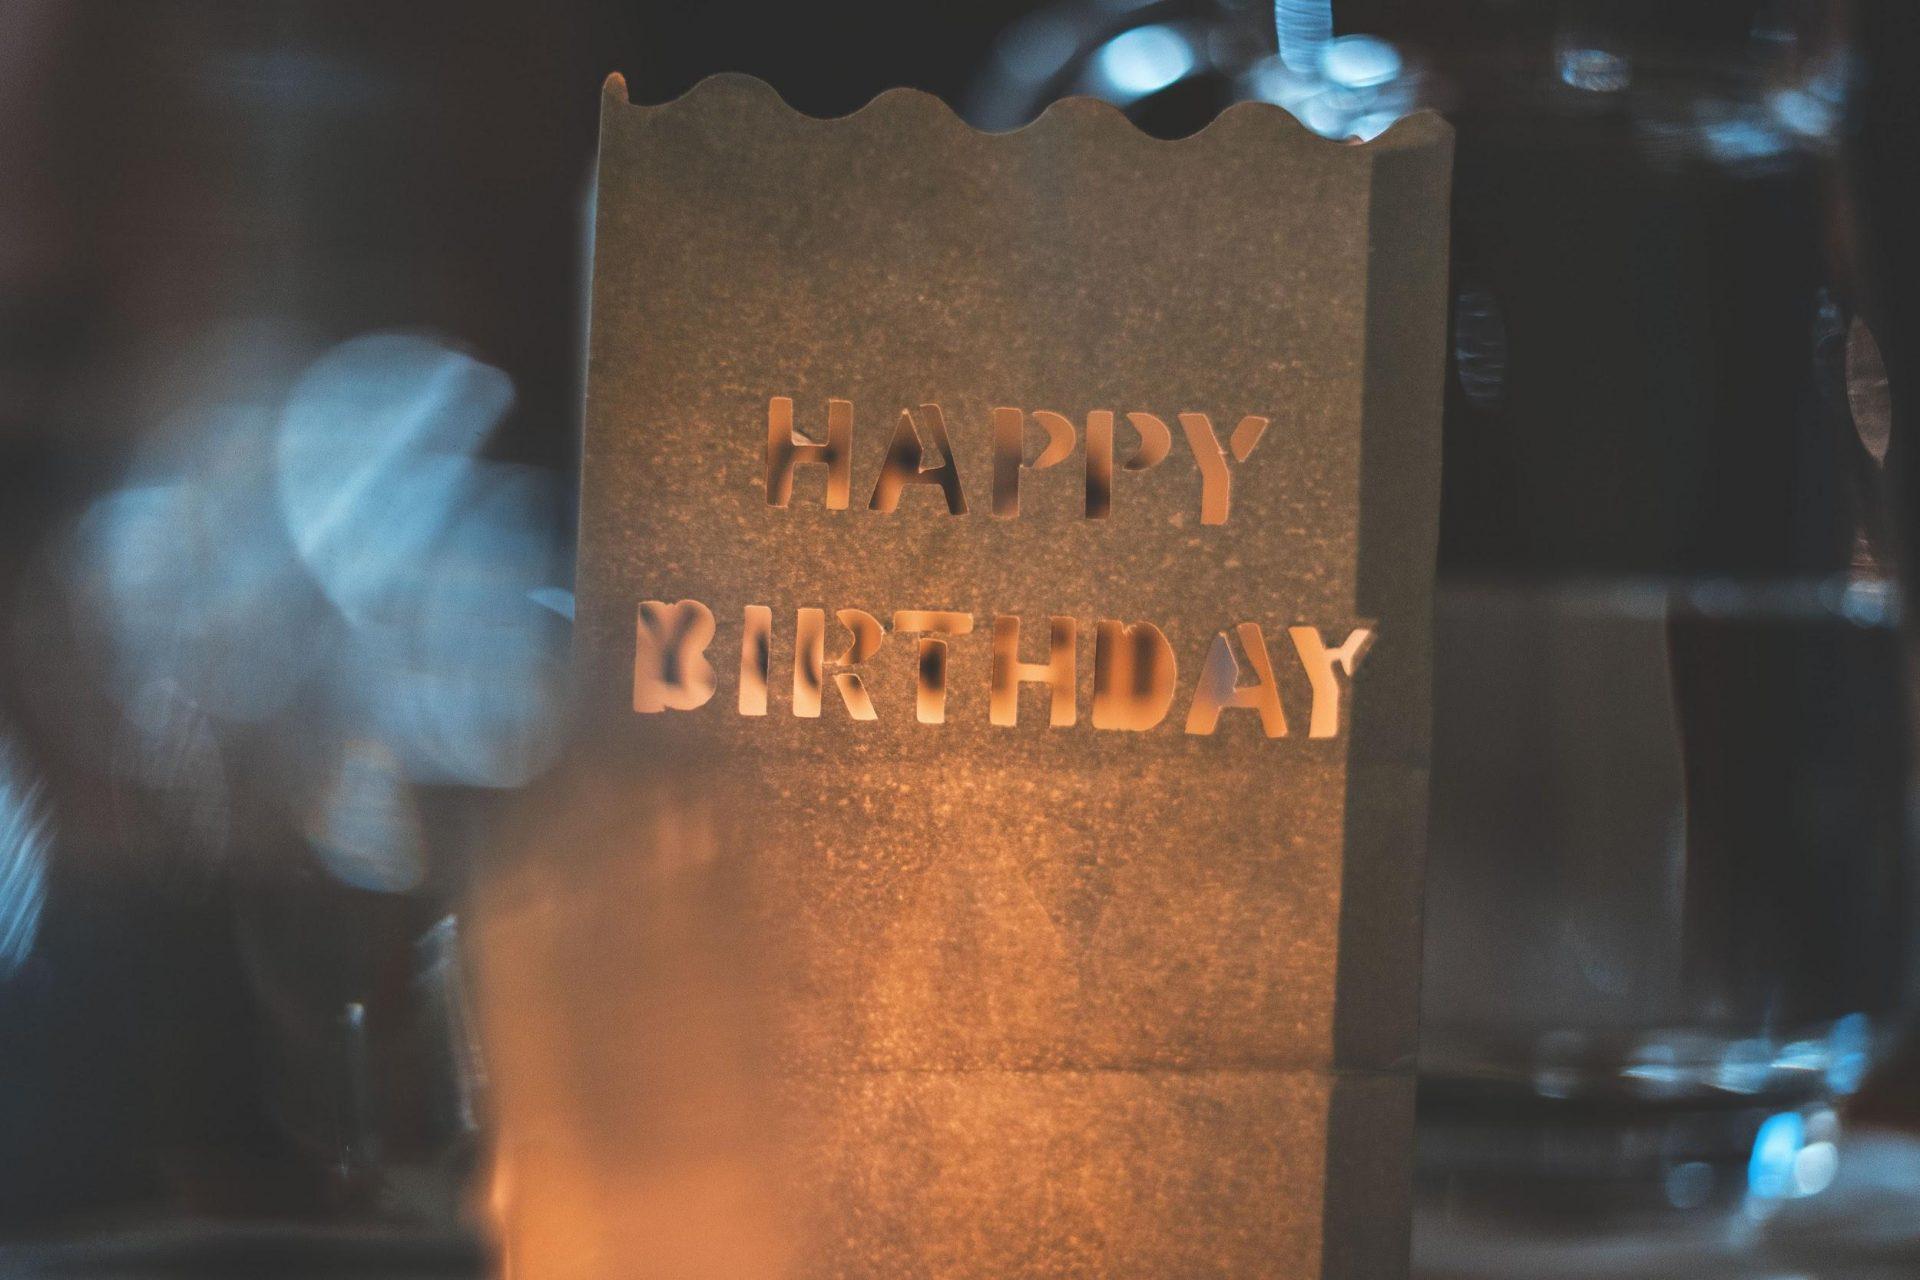 cadeautje, cadeau, verrassen, surprise, feest, feestje, geven, xmariekie, blogger